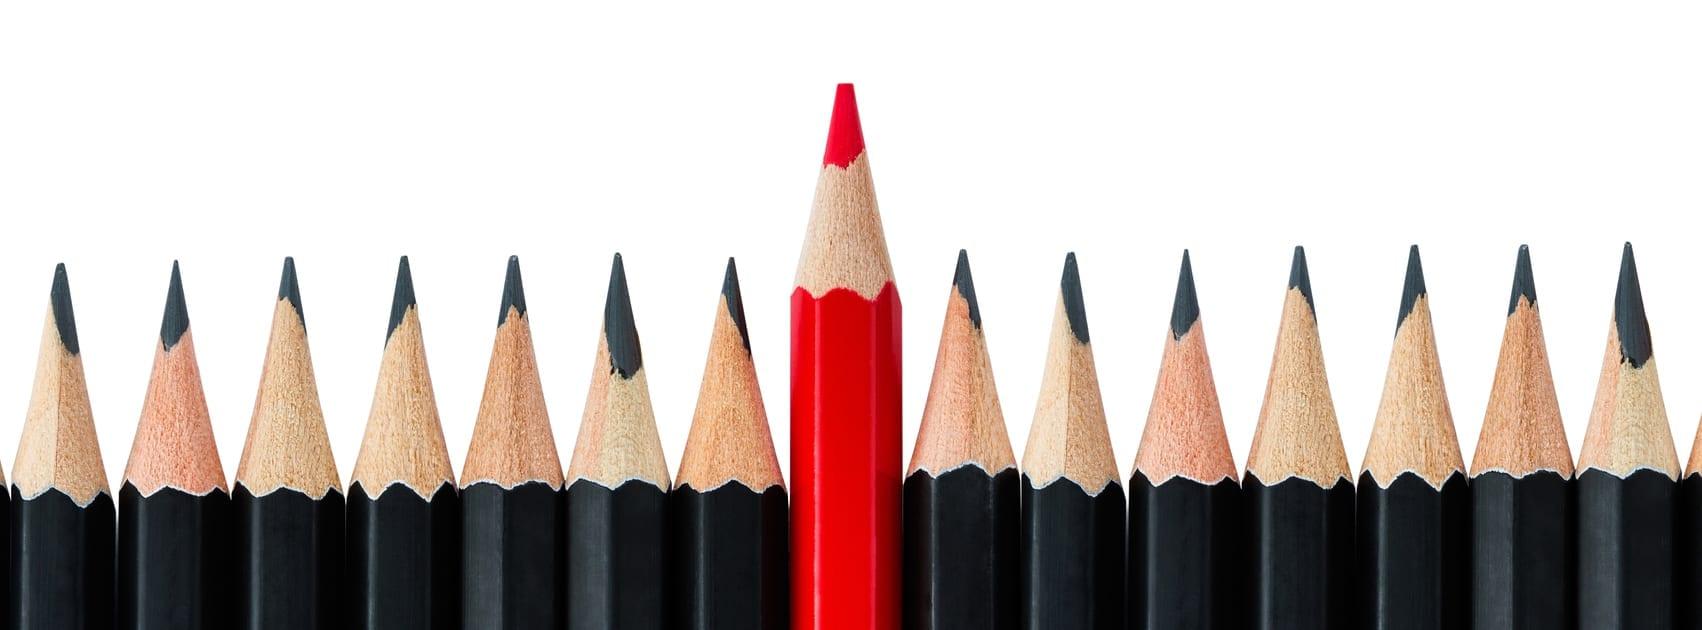 Pencils Header